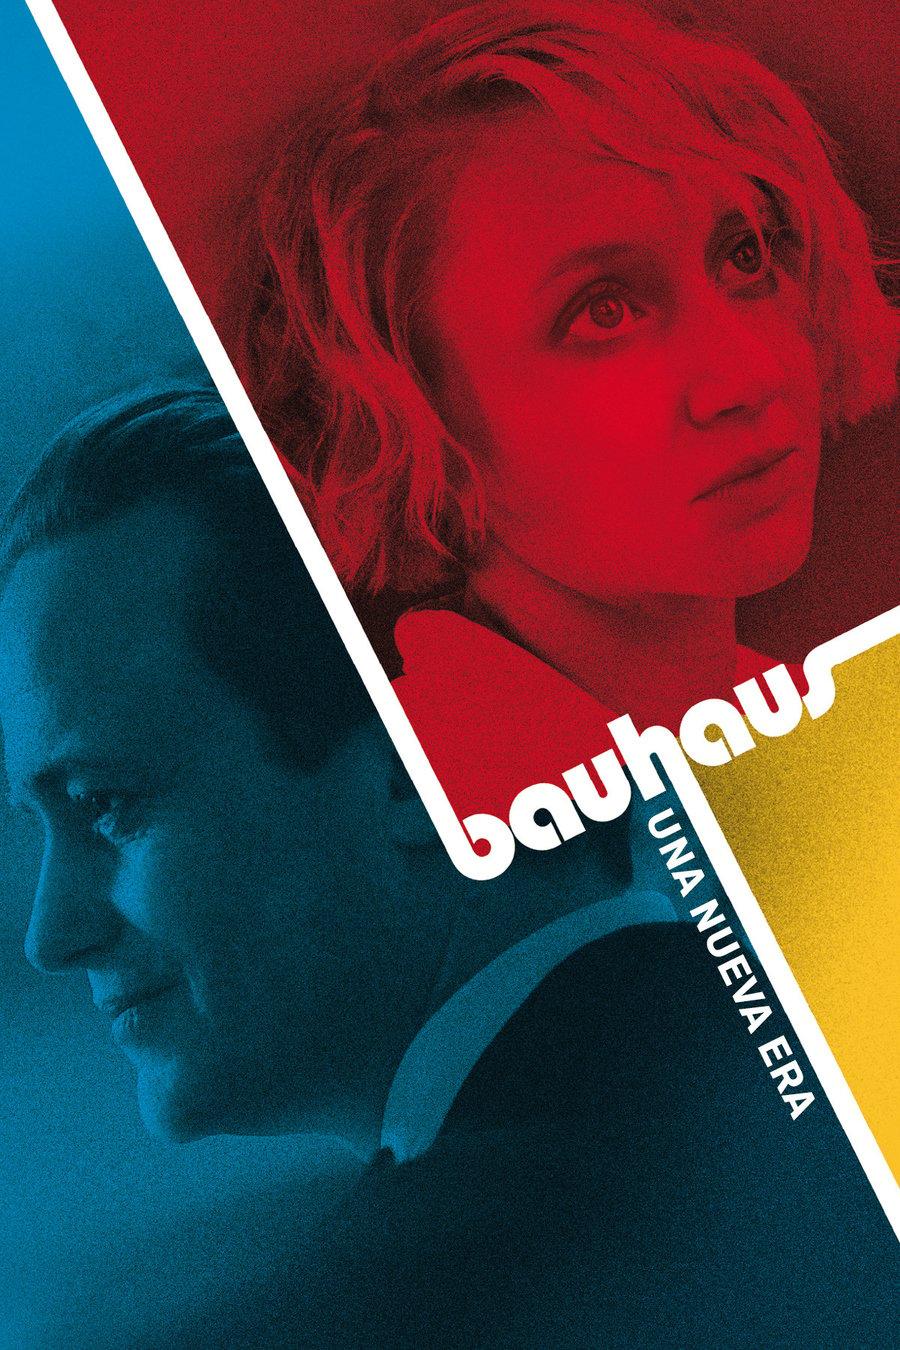 Bauhaus, una nueva era